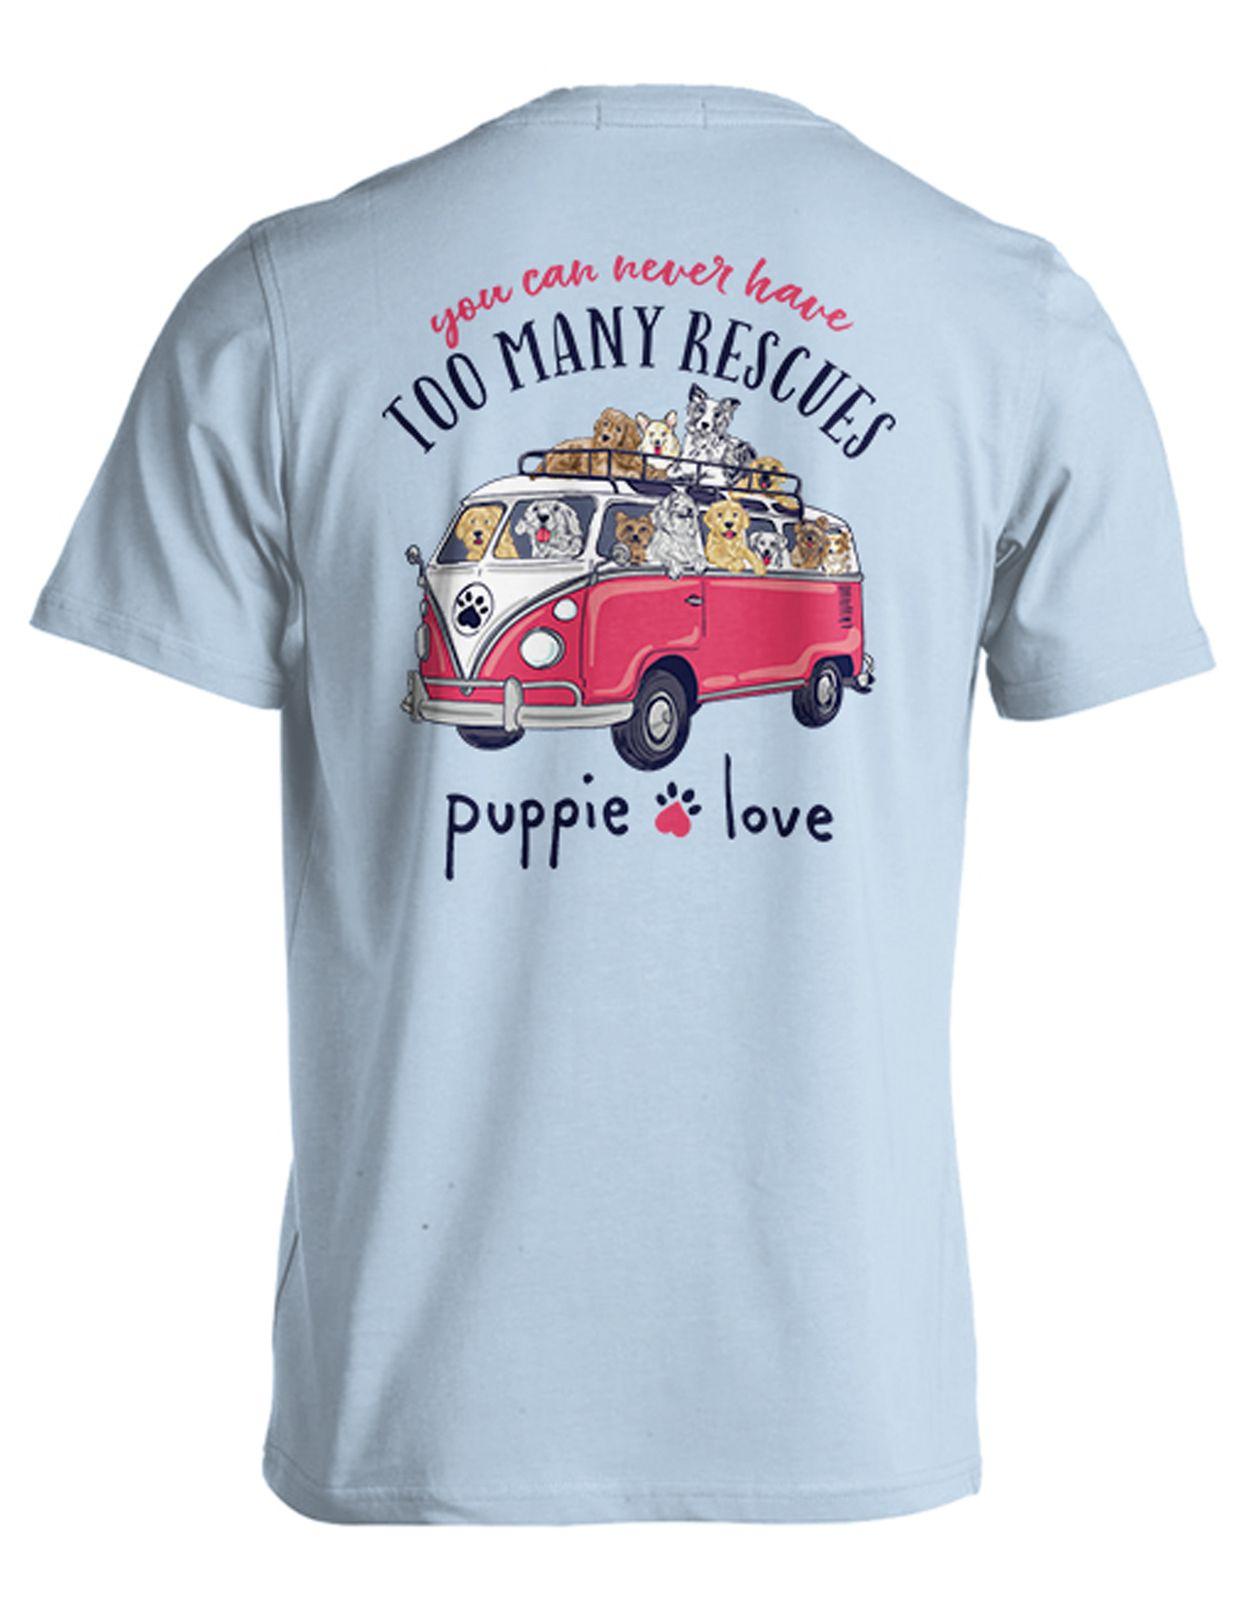 Puppie Love Rescue Dog Adult Unisex Short Sleeve Graphic T